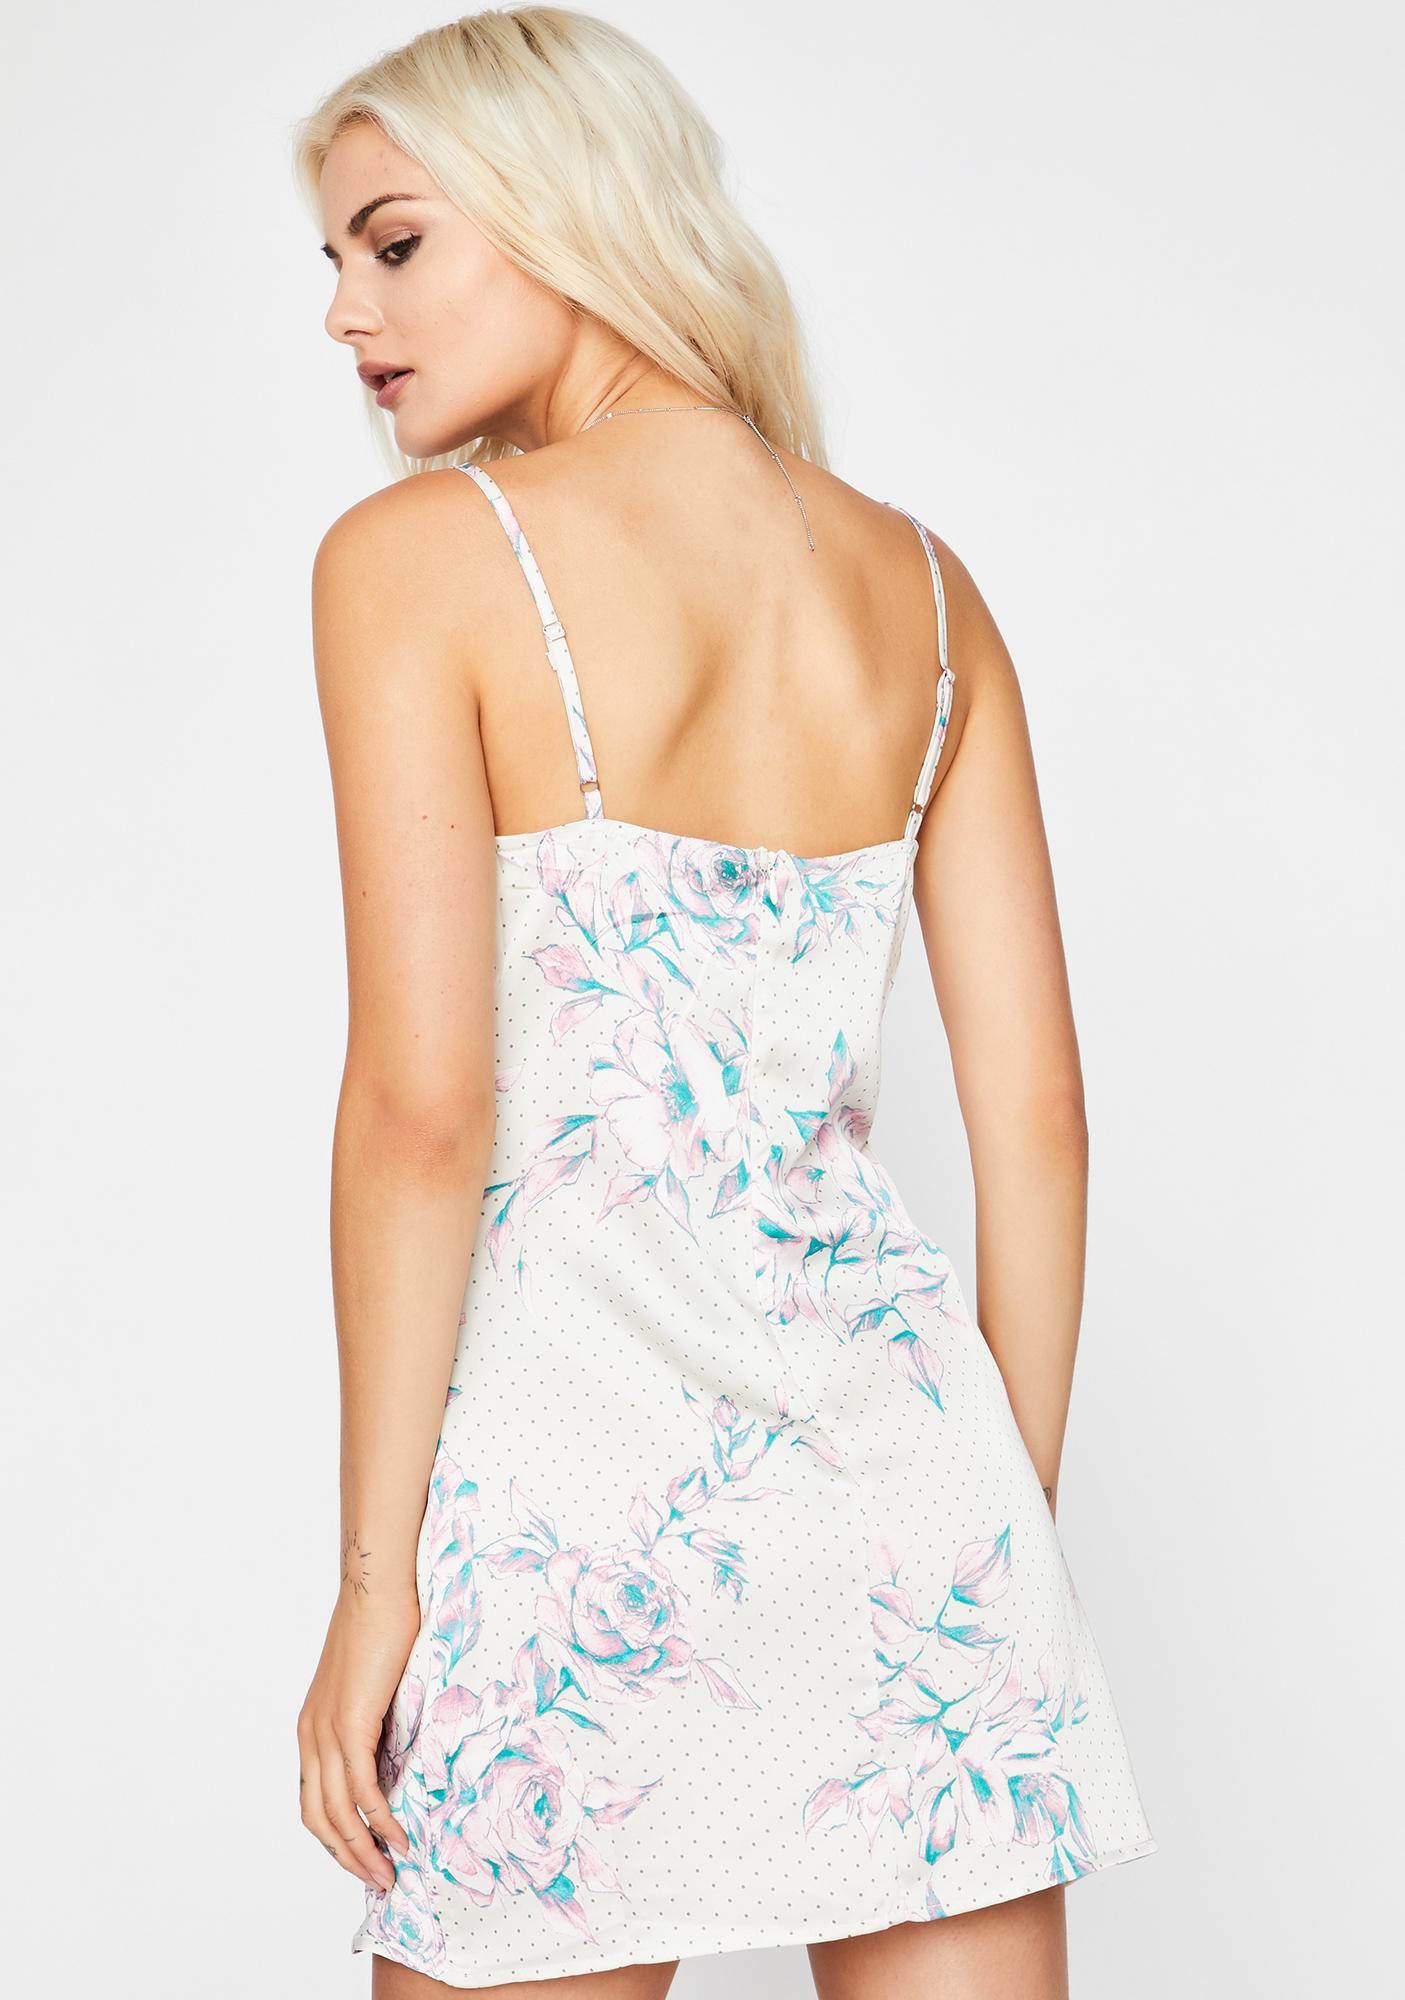 Precise Nature Mini Dress